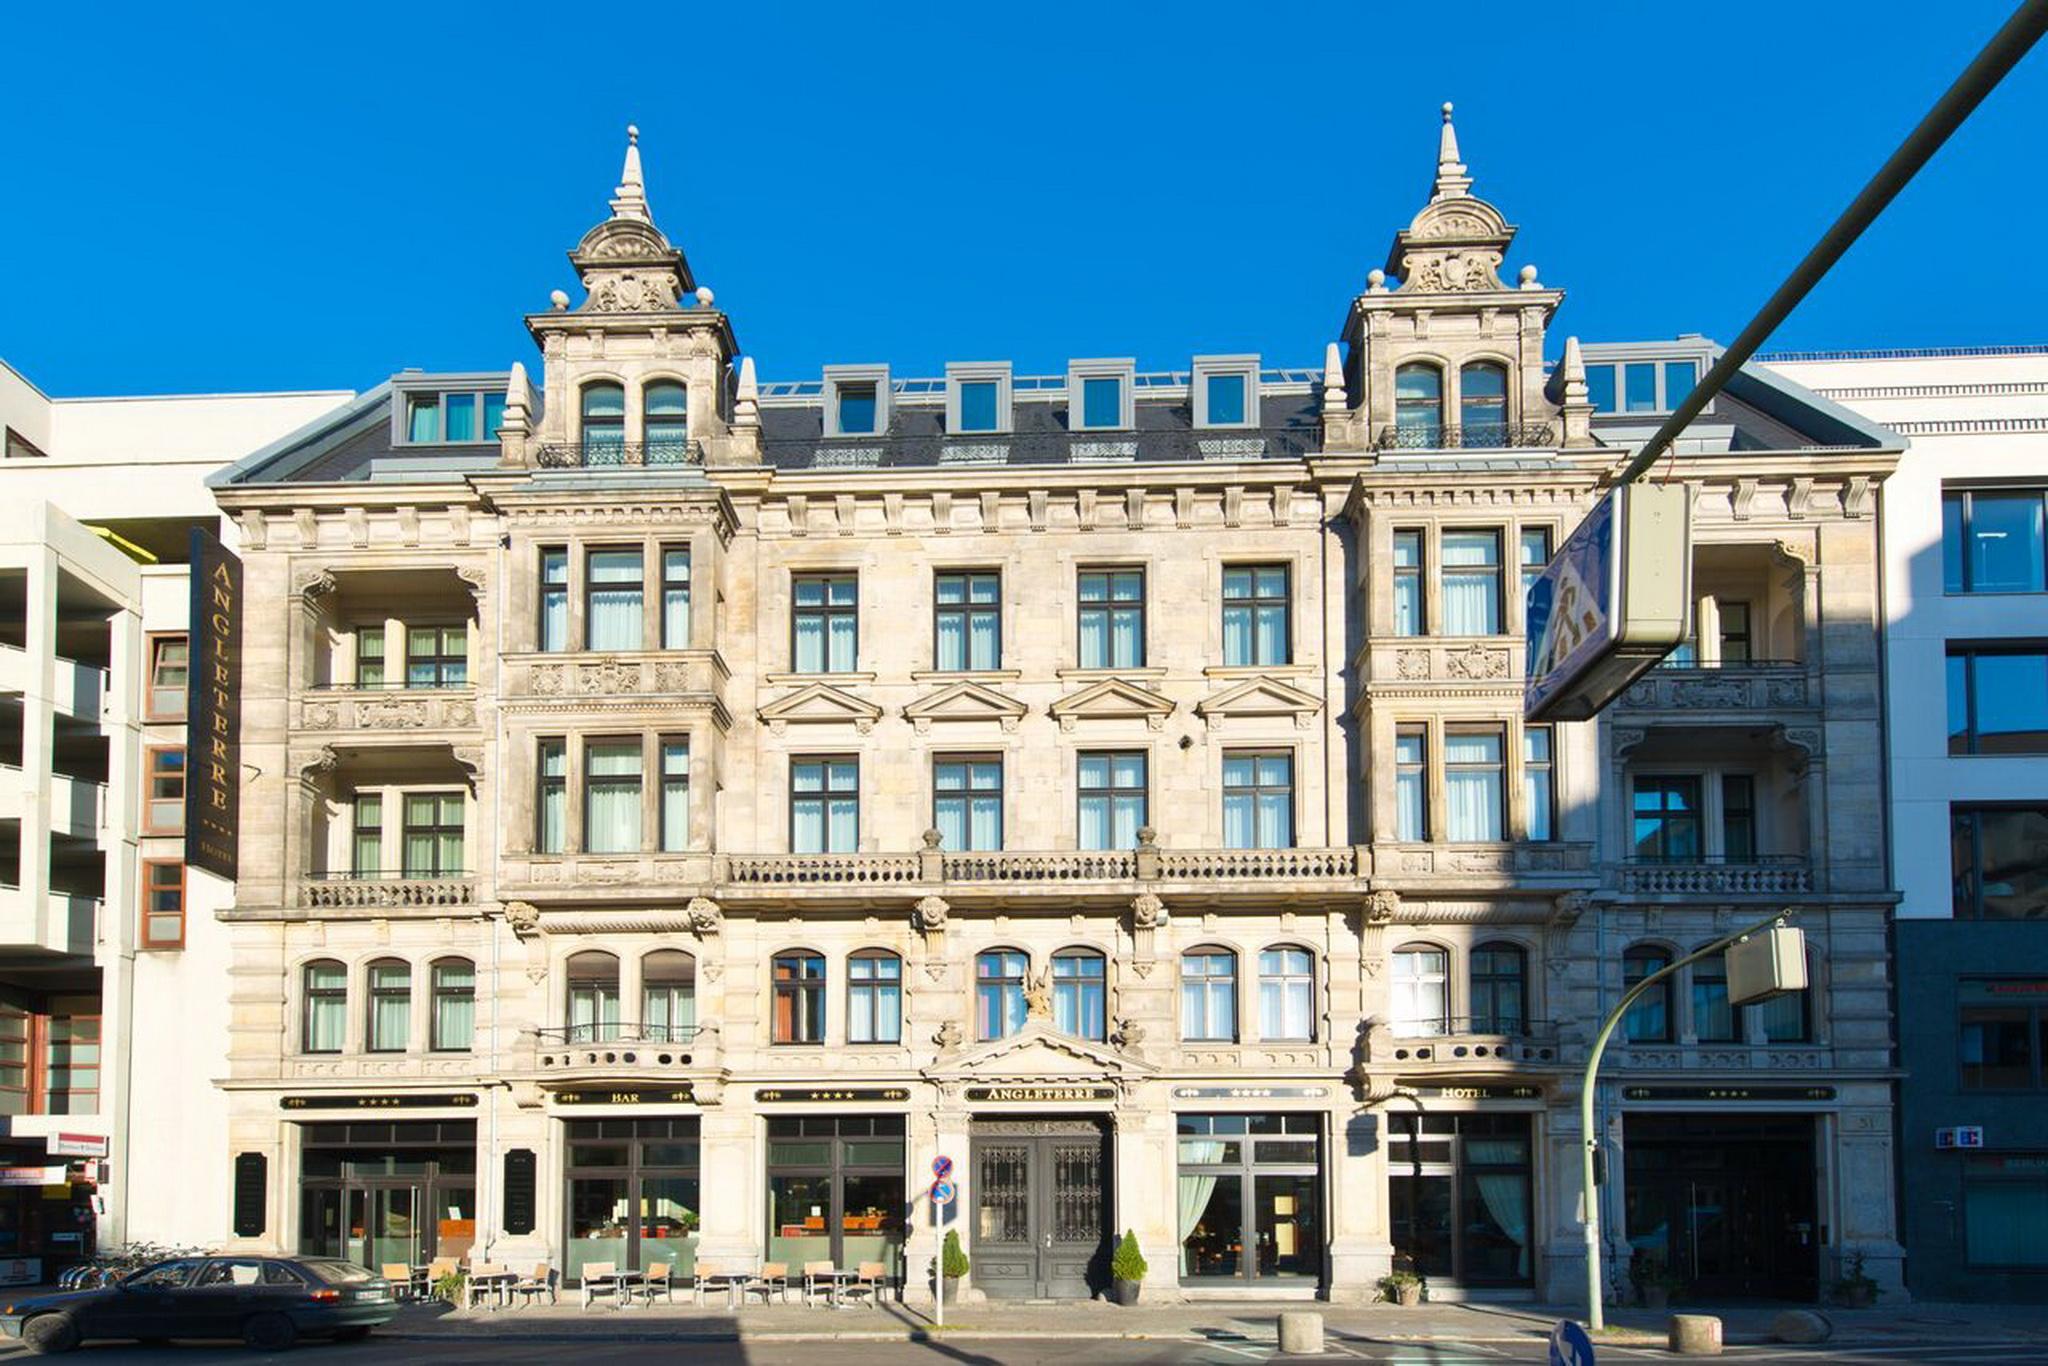 Angleterre Hotel, Berlin